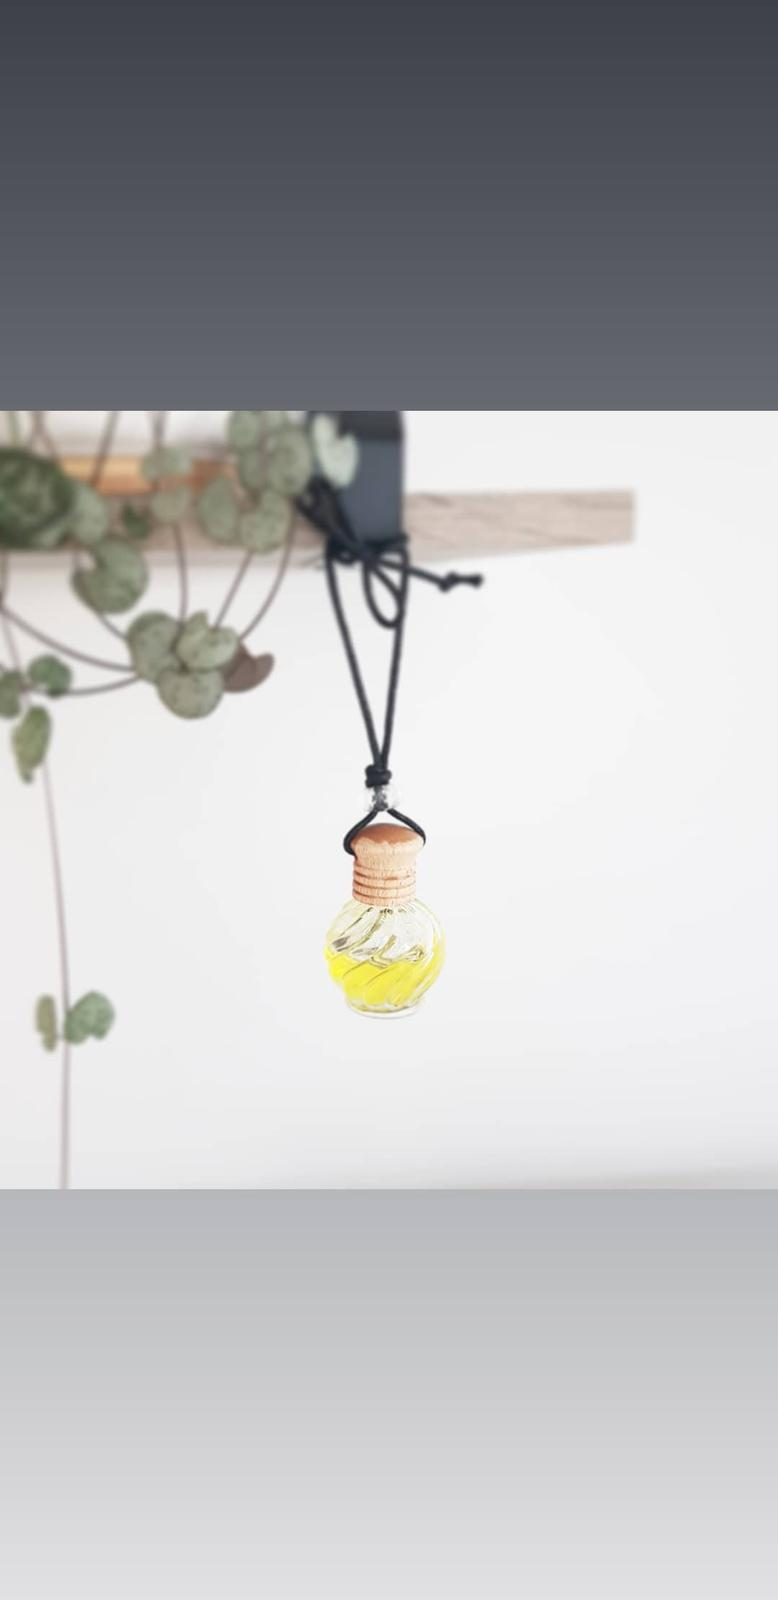 Hanging Fragrance Diffuser